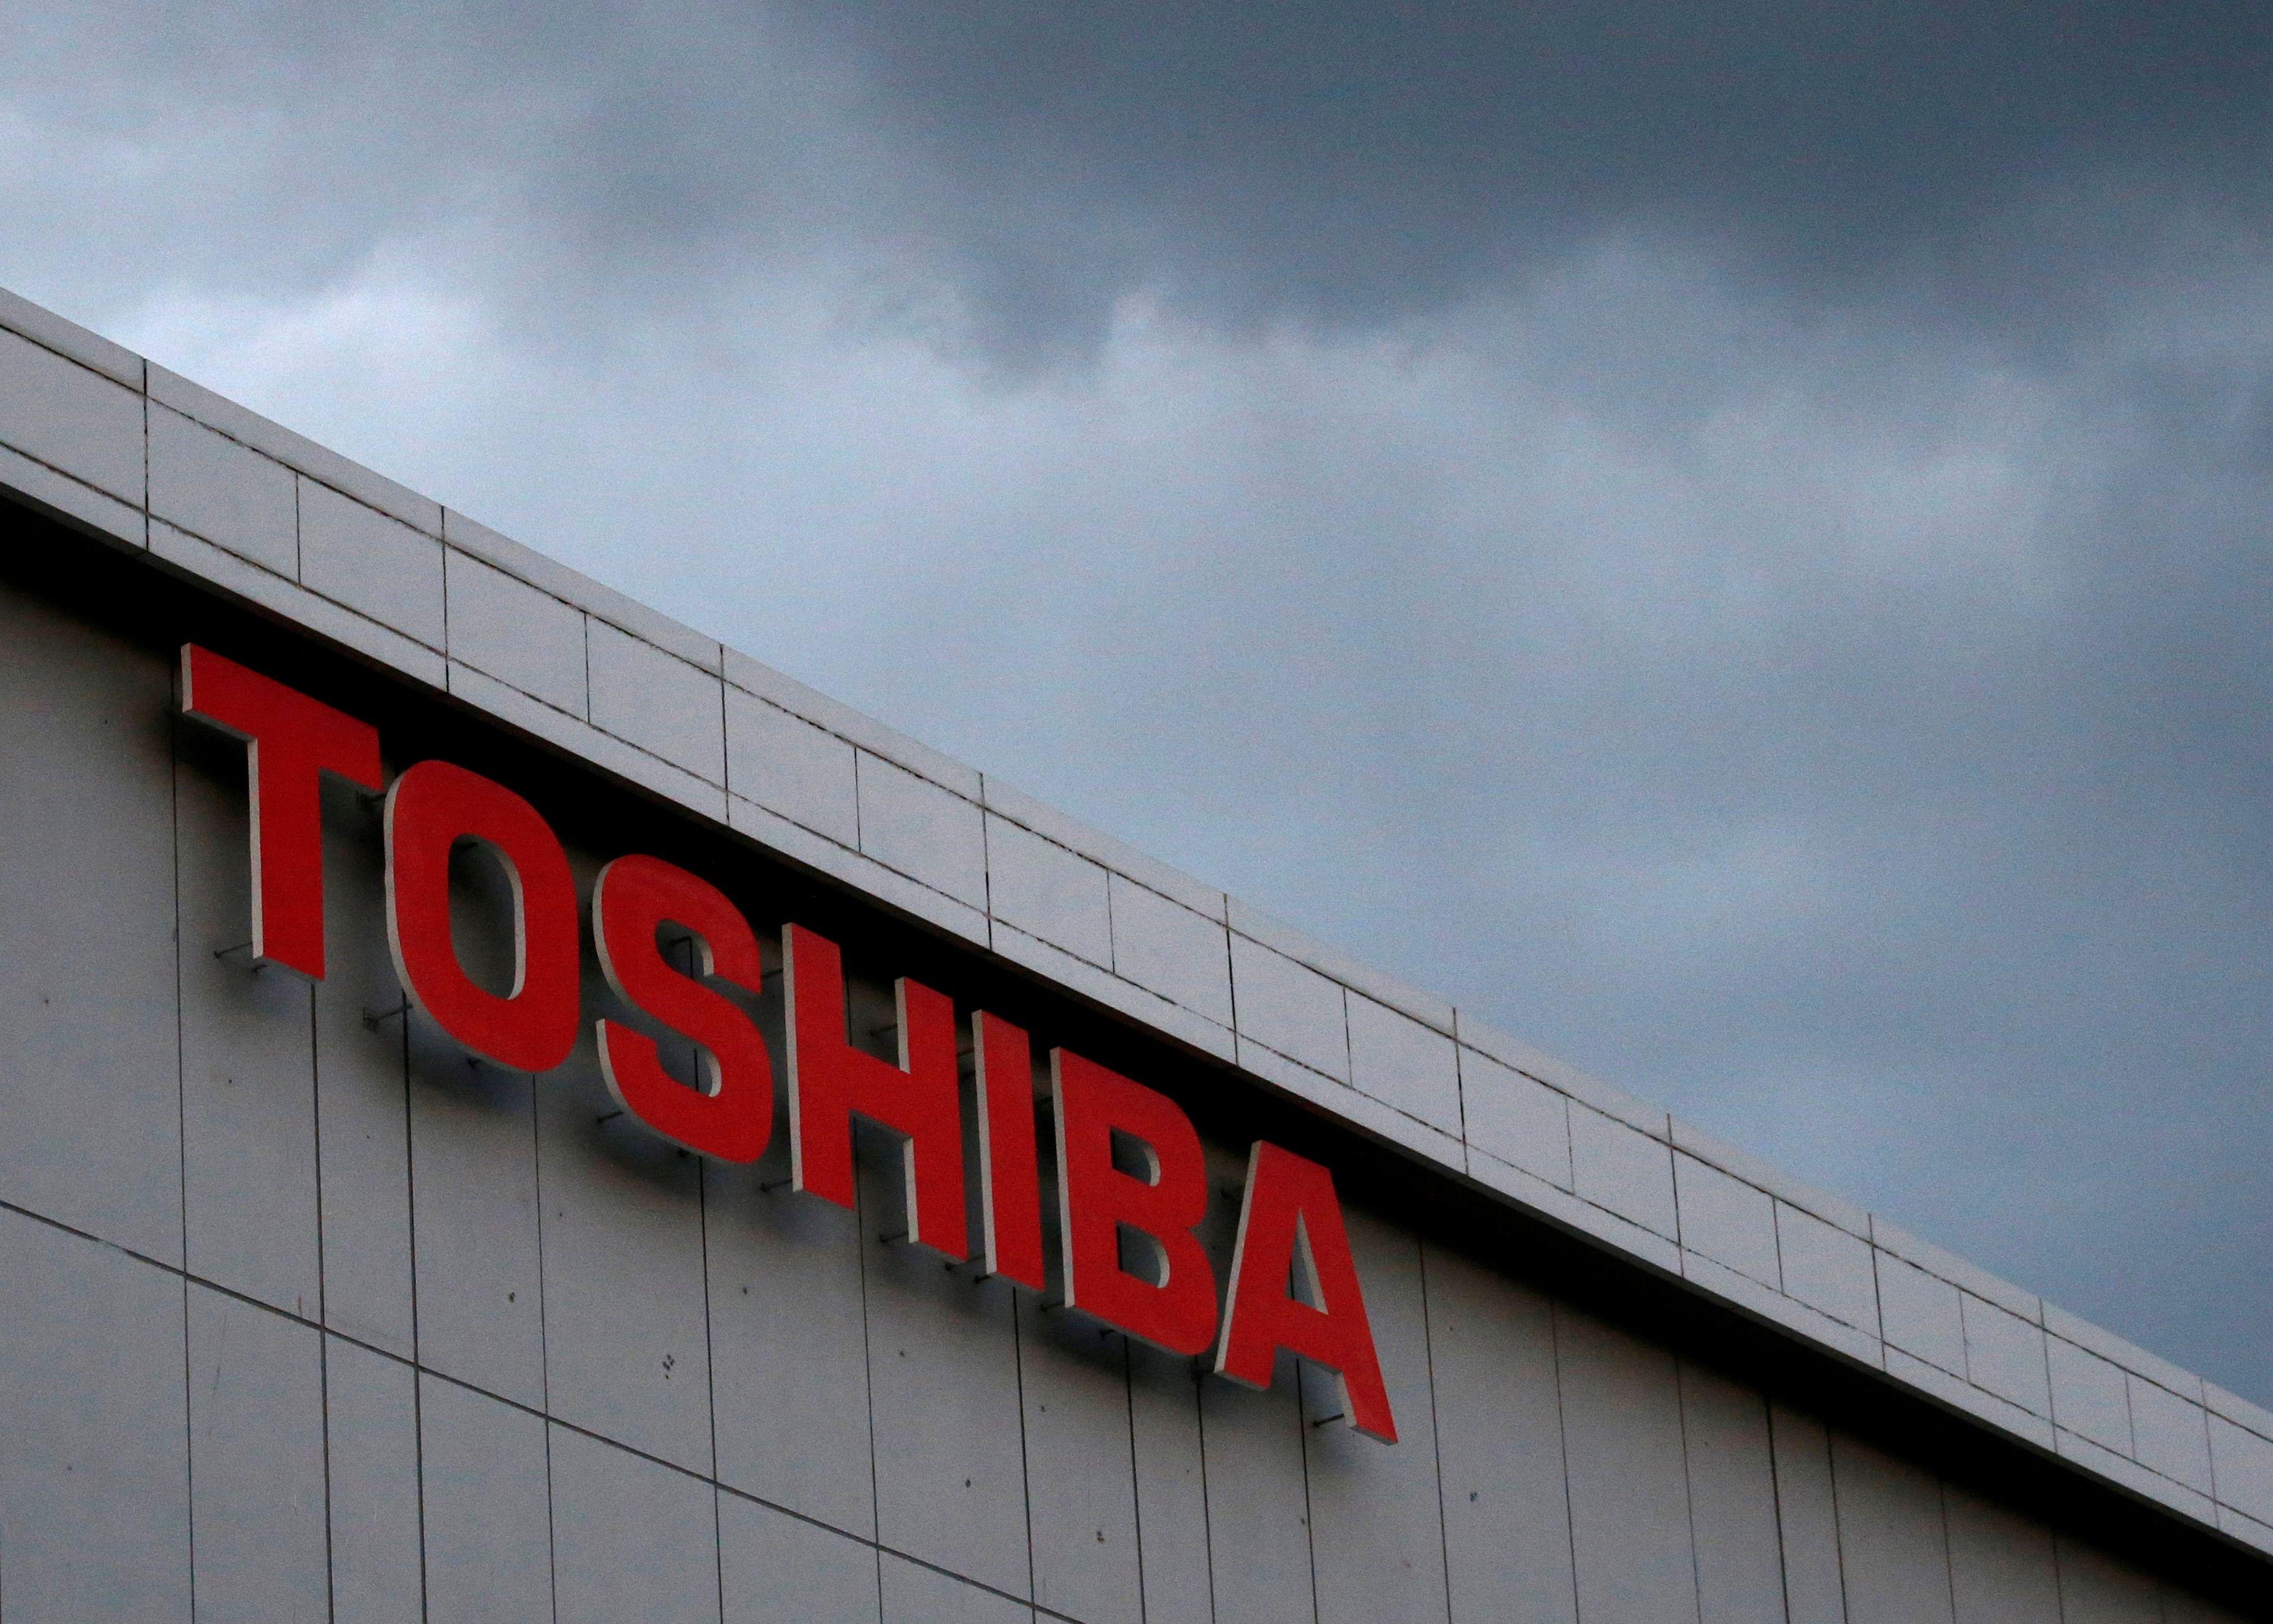 The logo of Toshiba Corp. is seen at the company's facility in Kawasaki, Japan February 13, 2017. REUTERS/Issei Kato